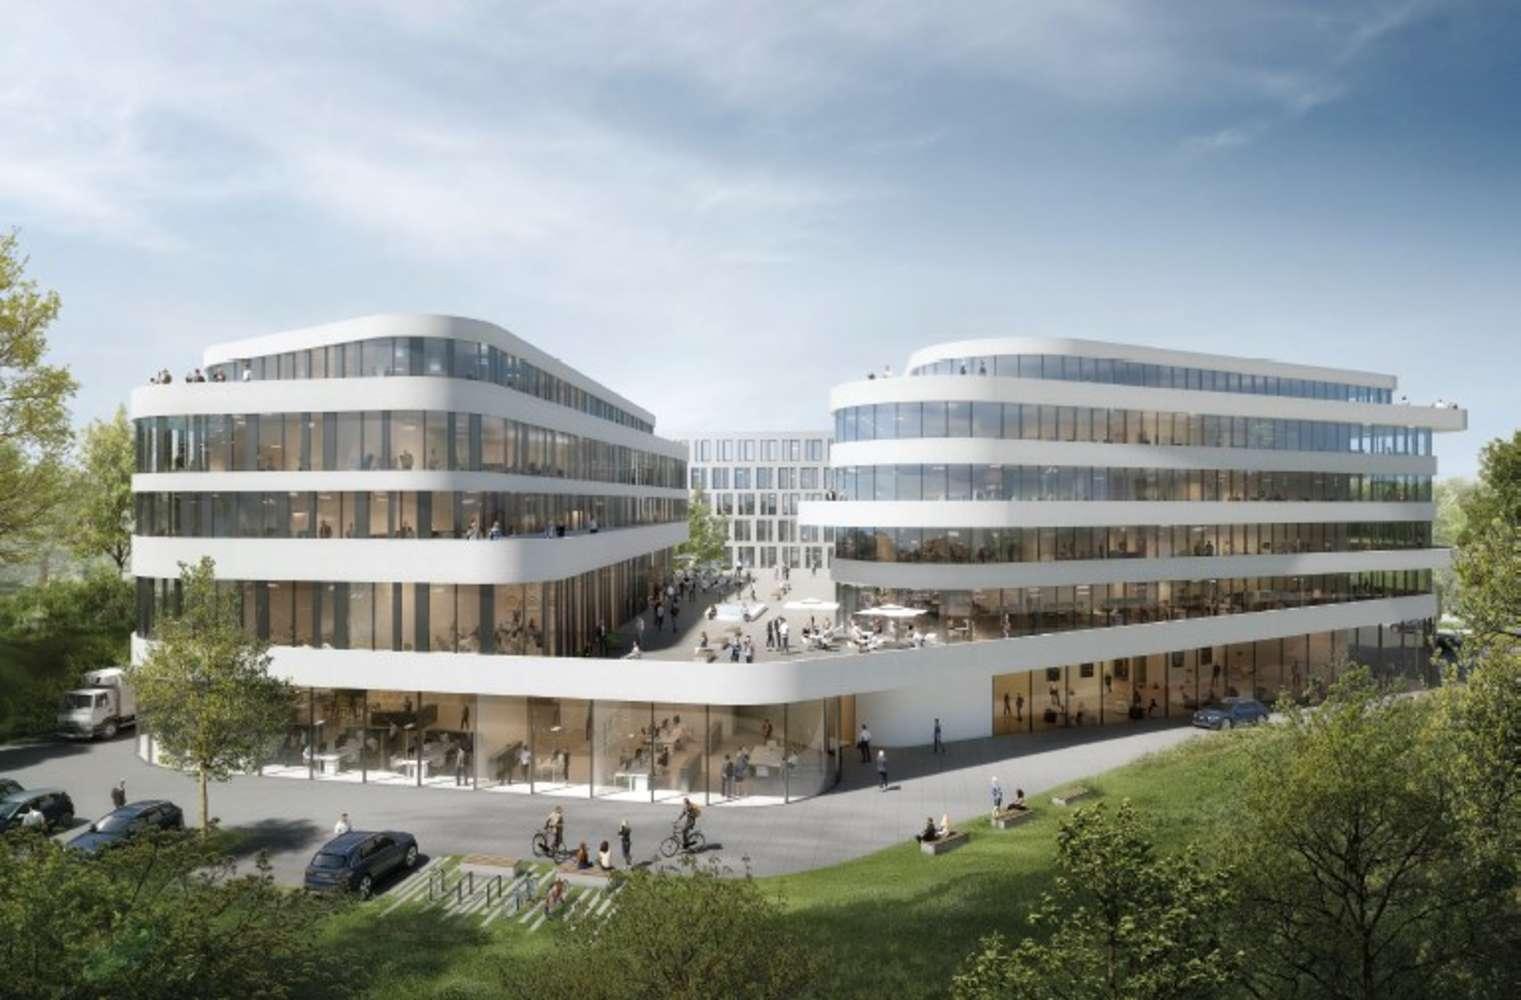 Büros Bad homburg, 61352 - Büro - Bad Homburg - F2314 - 10017321